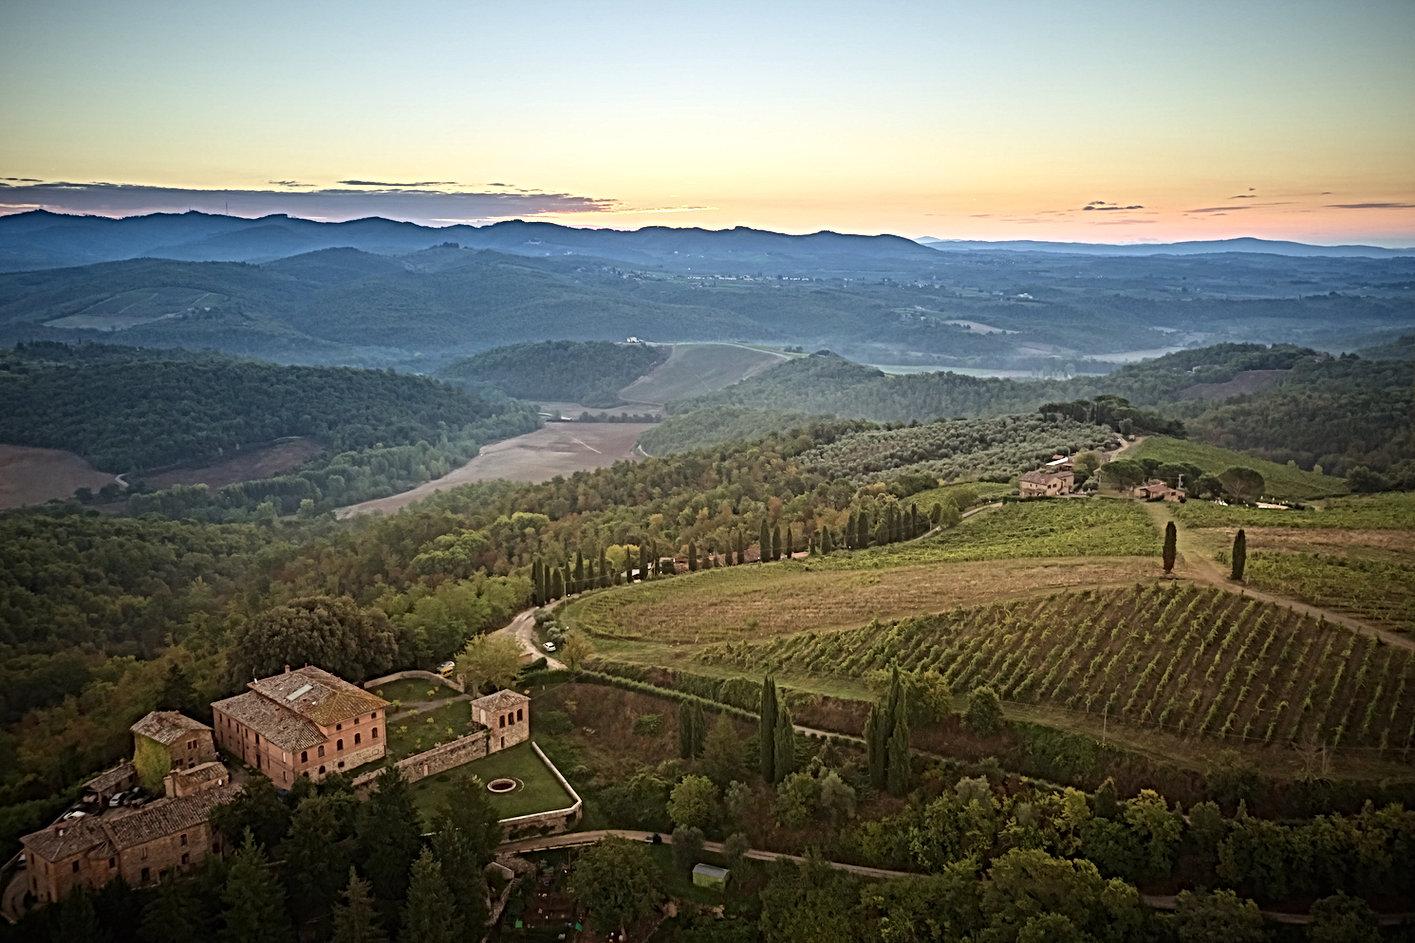 Castello-de-Selvole-DJ-000075 1.jpg